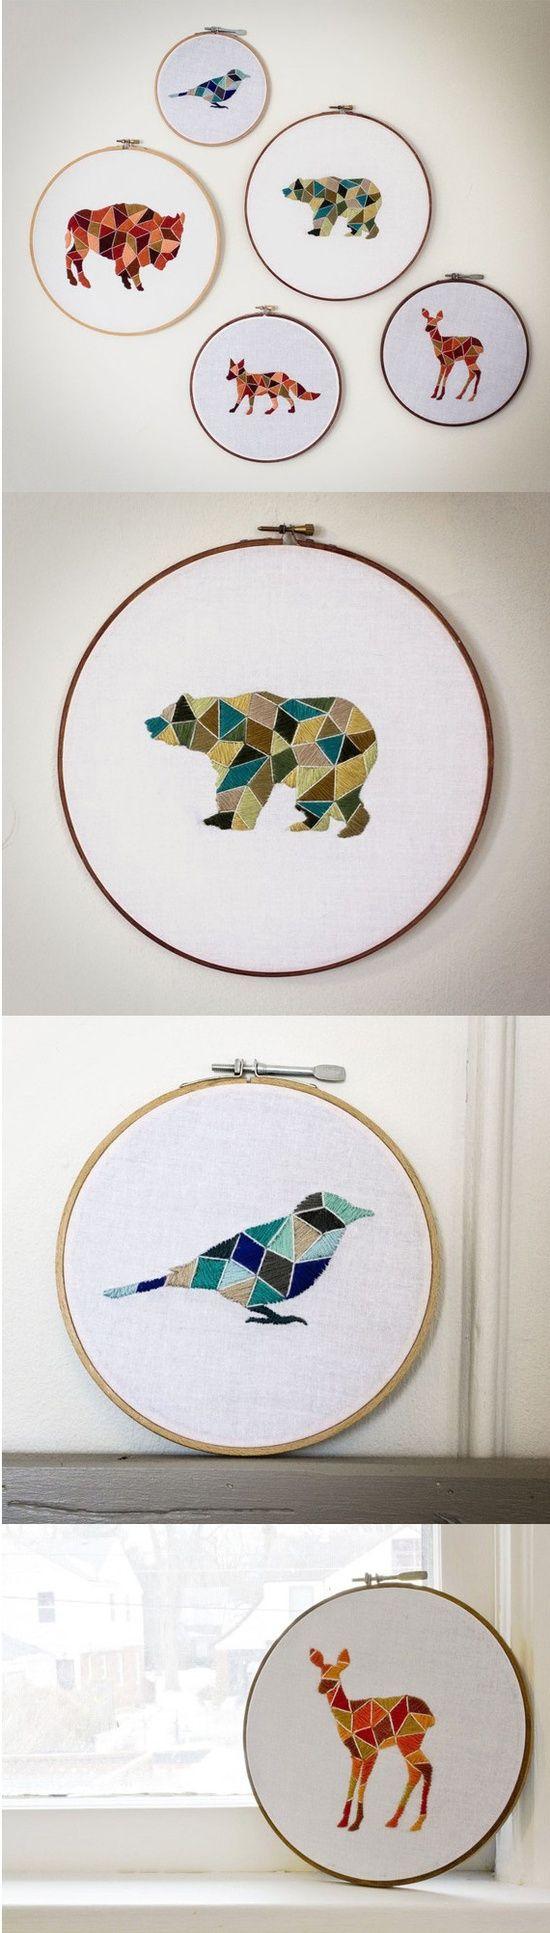 Geometric mosaic-style animal embroidery hoop designs